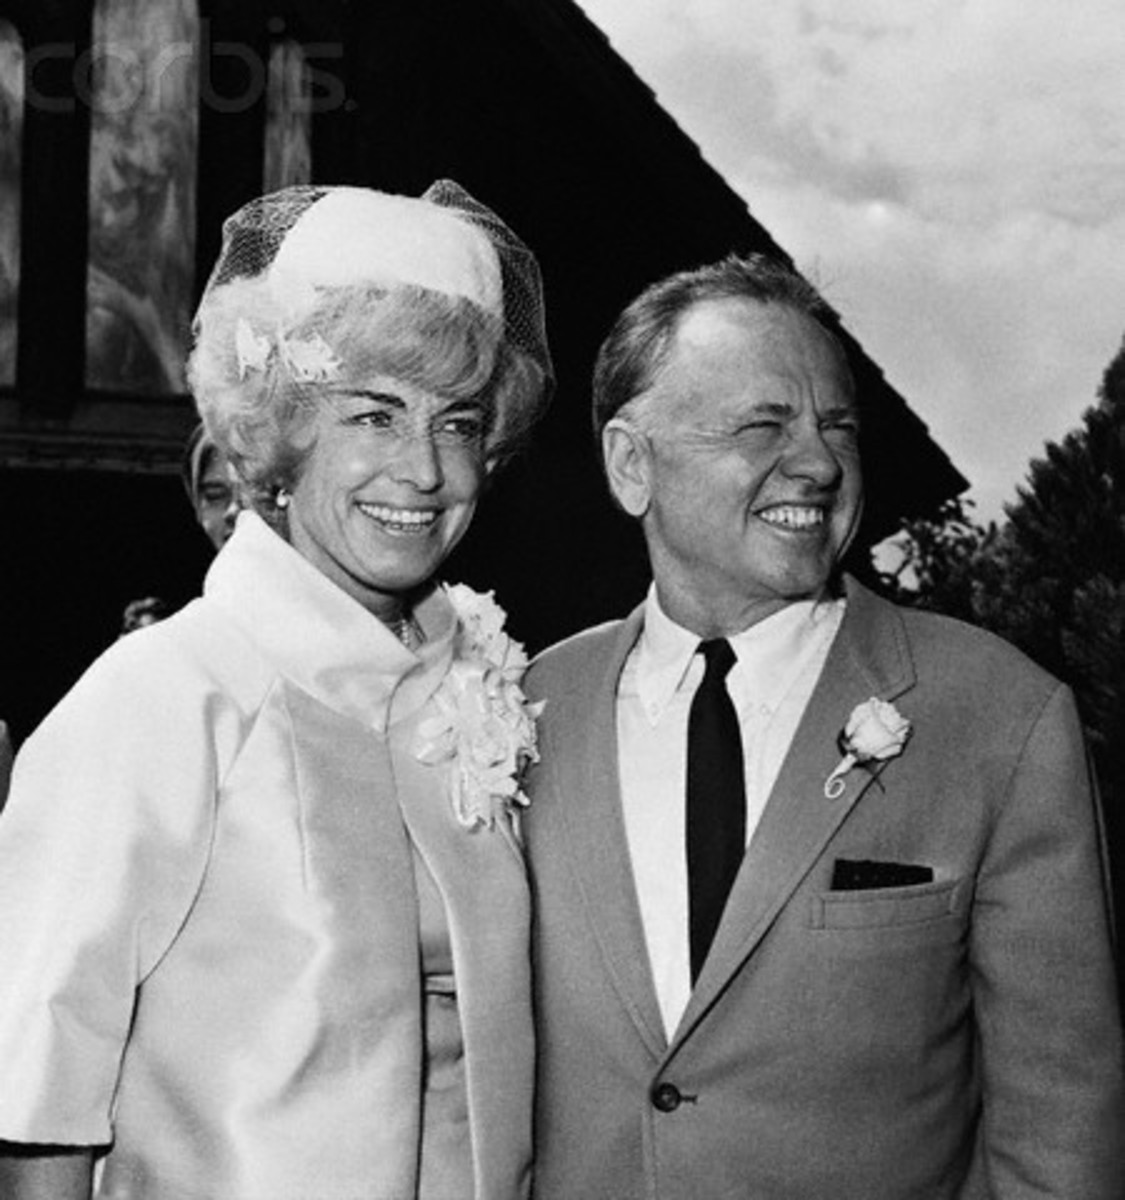 1966, Marge Lane, number 6